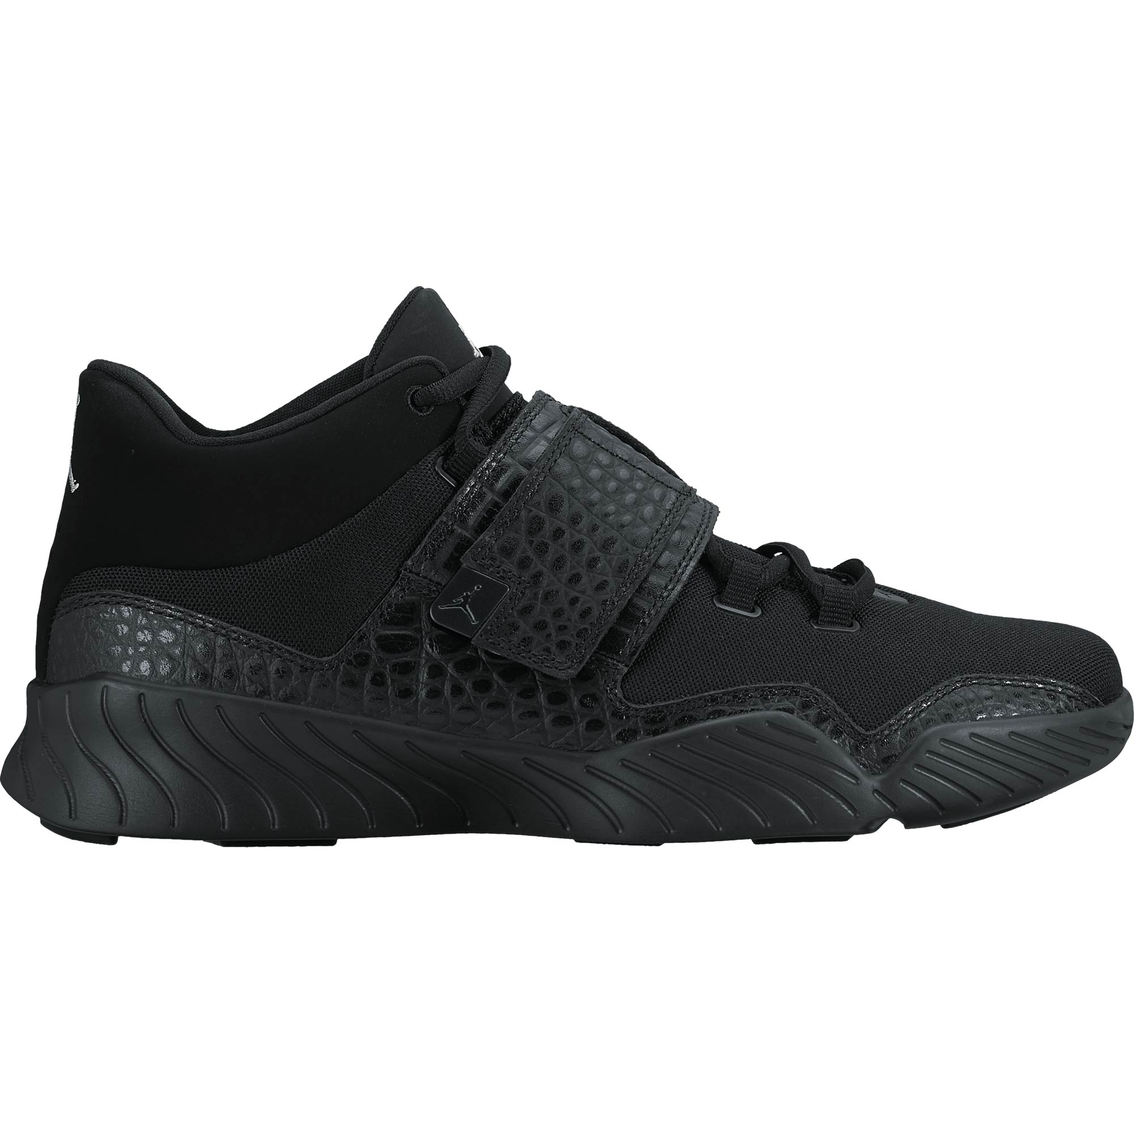 Jordan Men's J23 Athletic Shoes   Sneakers   Father's Day Shop ...